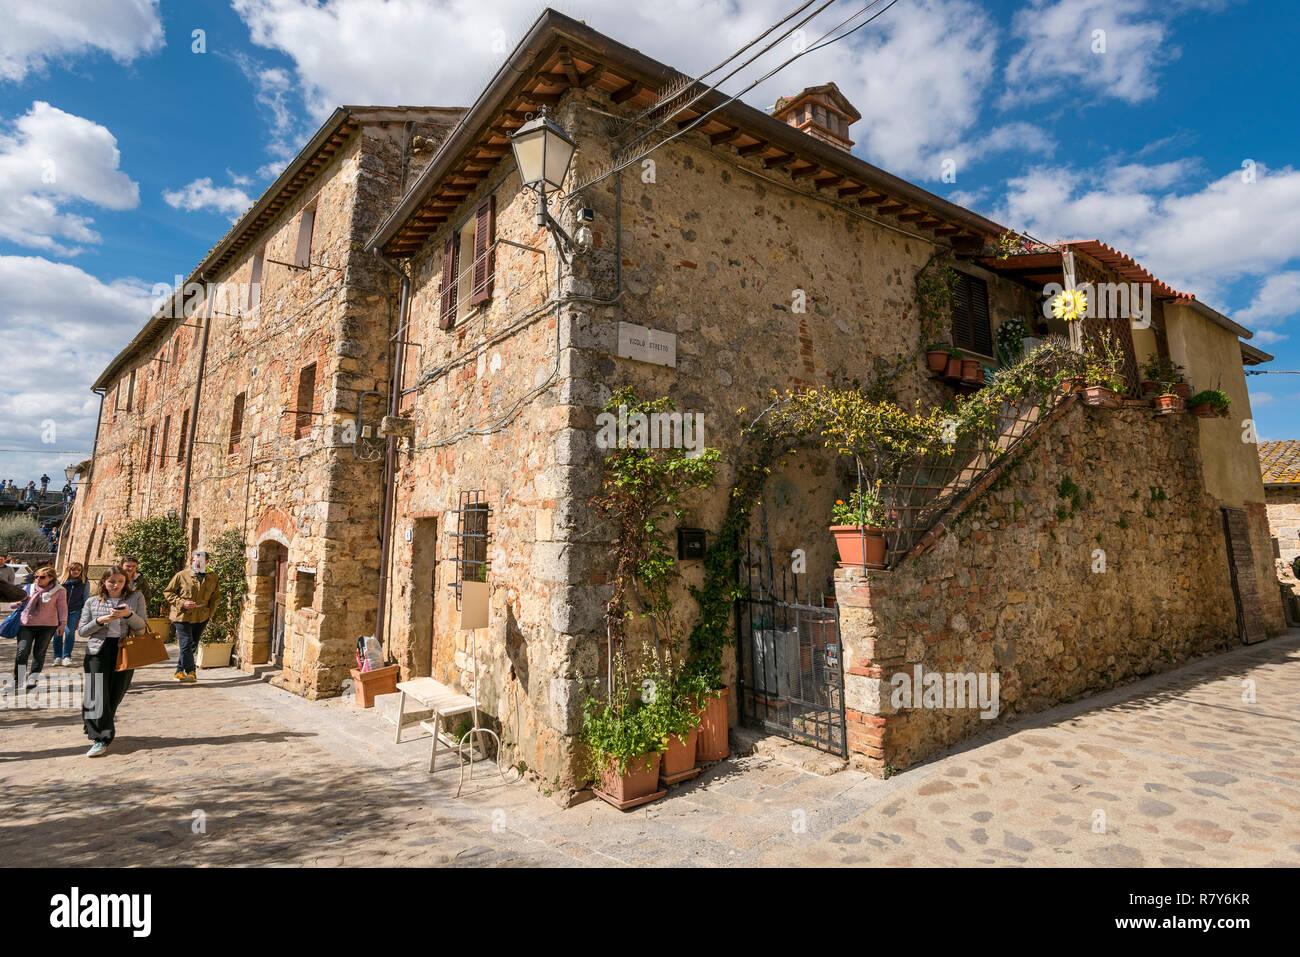 Horizontal streetview inside the walls of Monteriggioni, Italy. - Stock Image